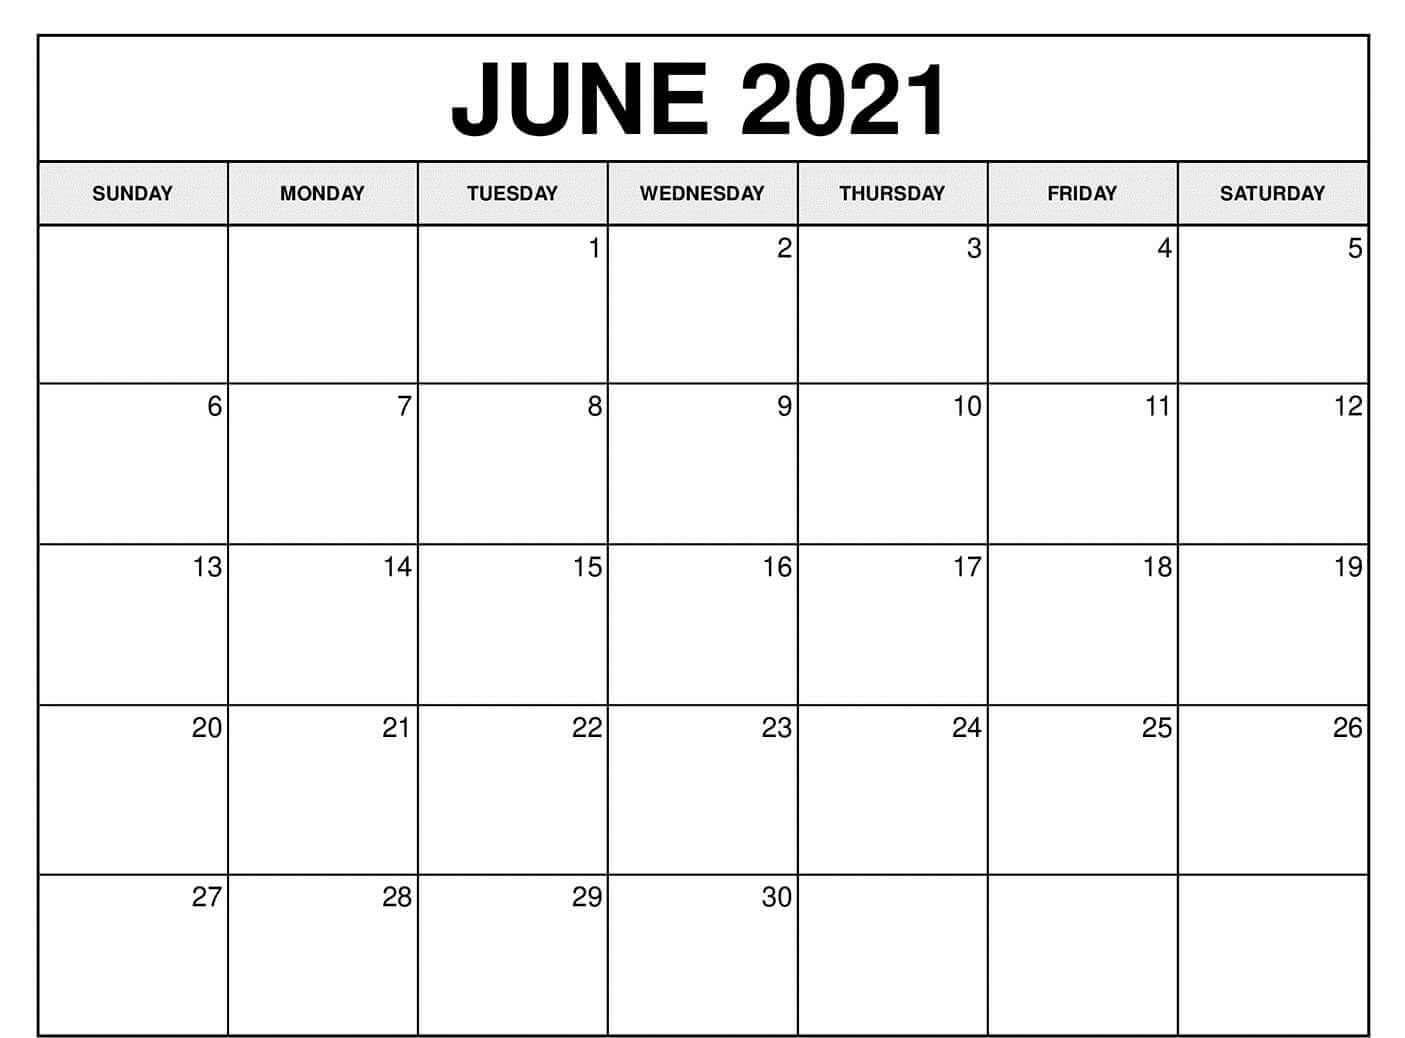 June 2021 Calendar Printable Blank Template